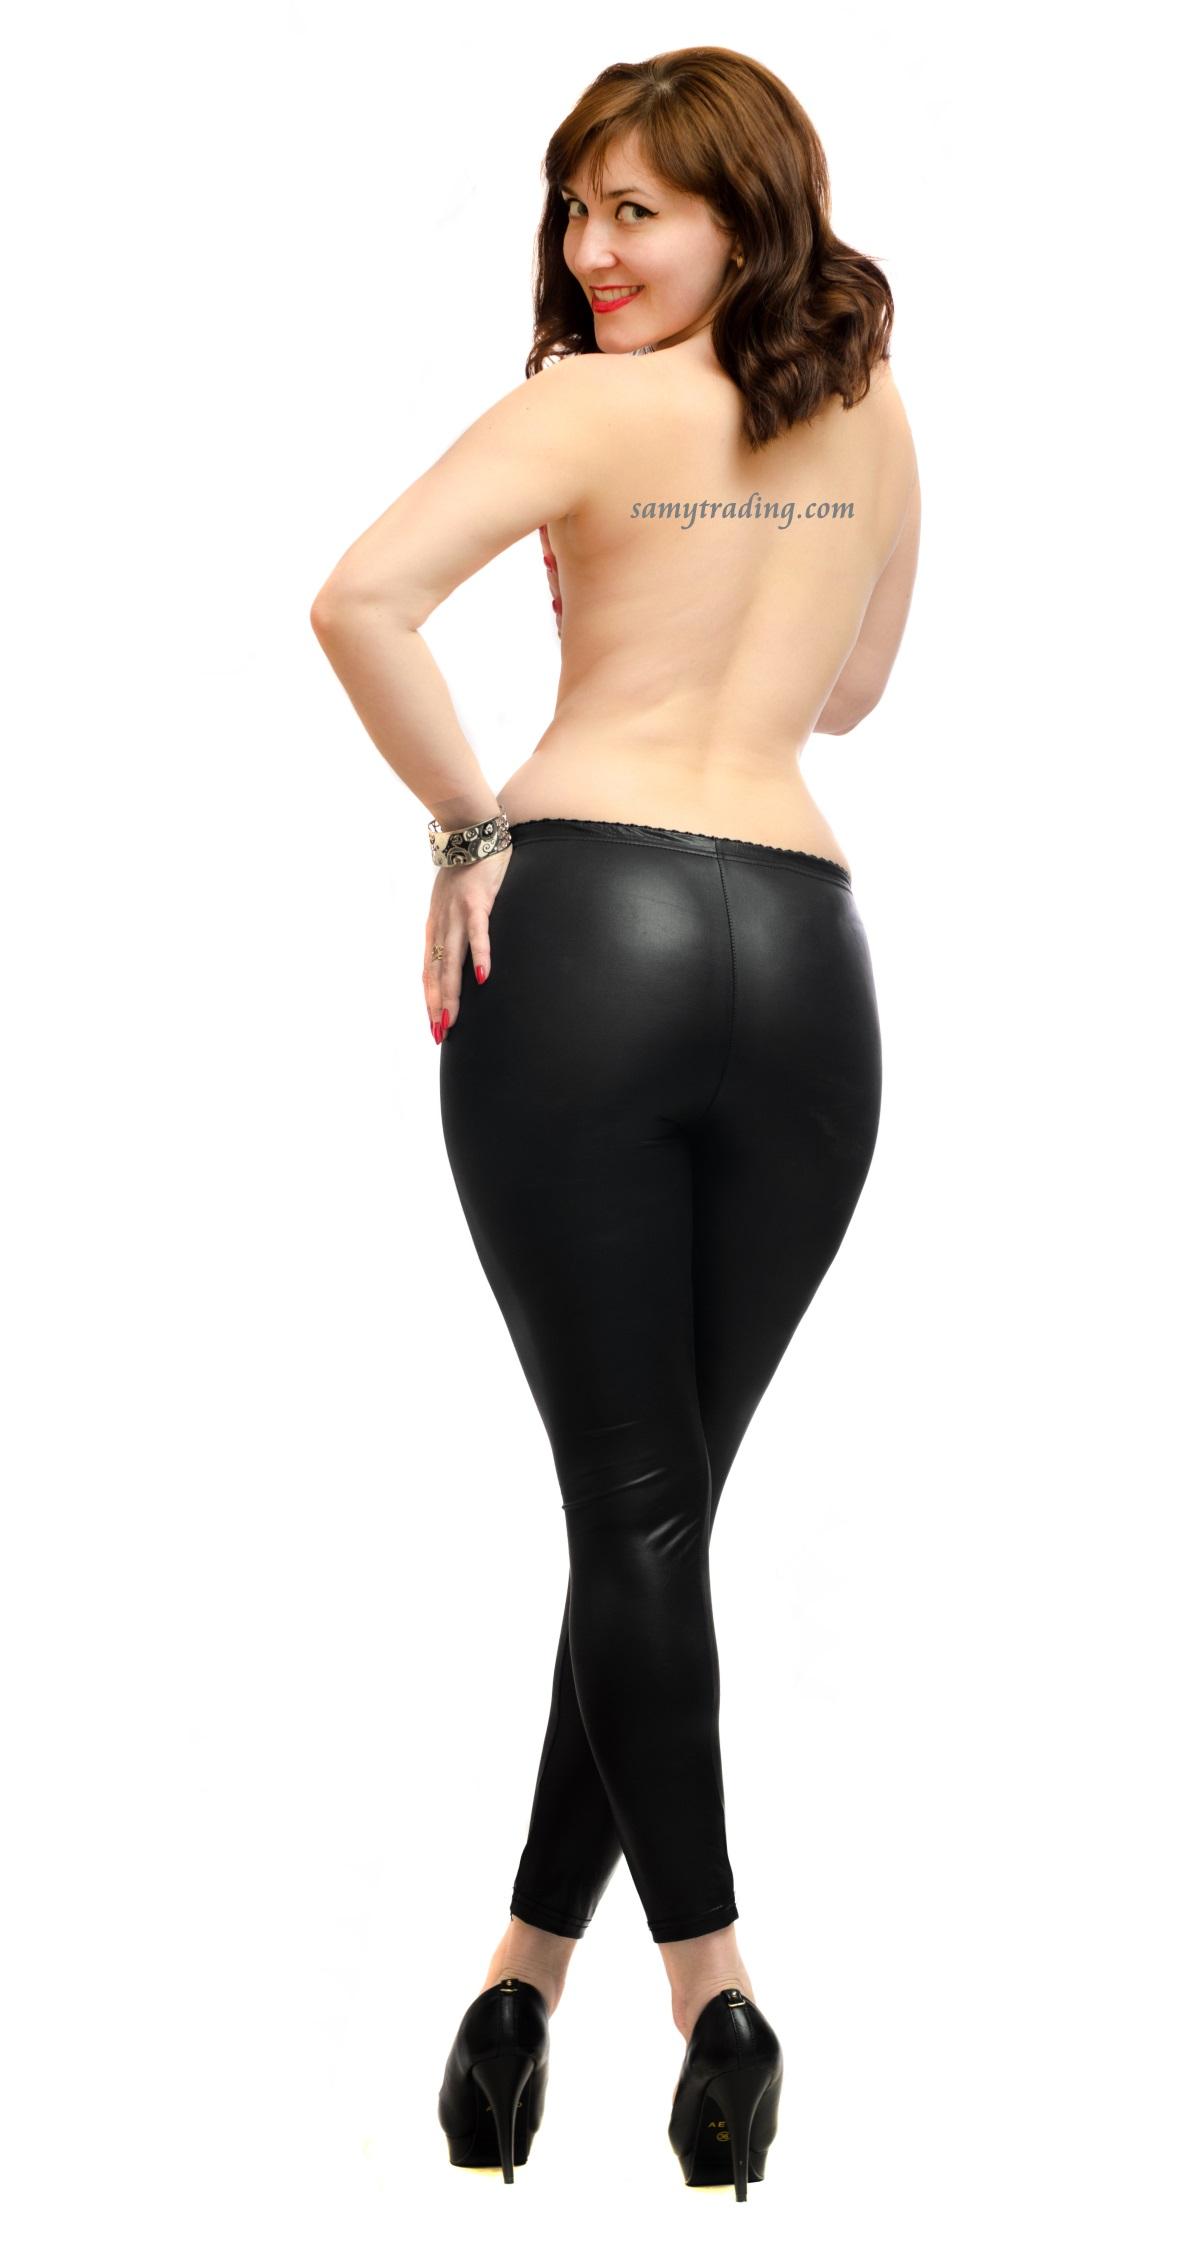 sexy-back-samytrading